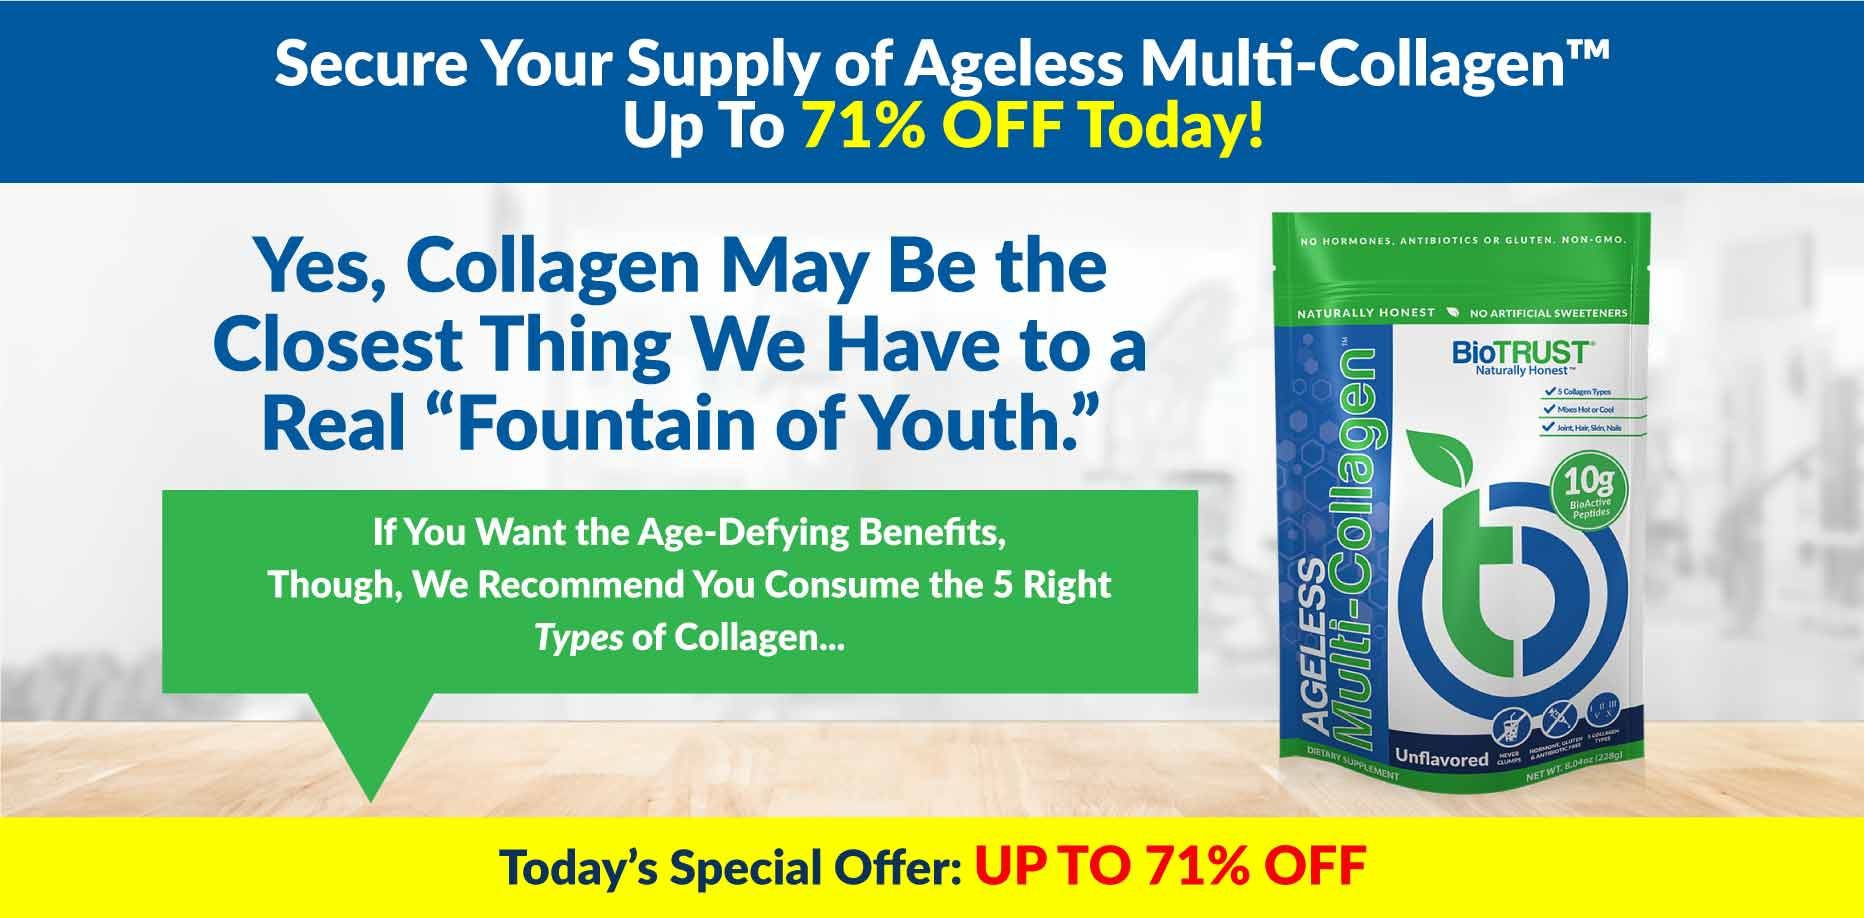 Ageless Multi-Collagen